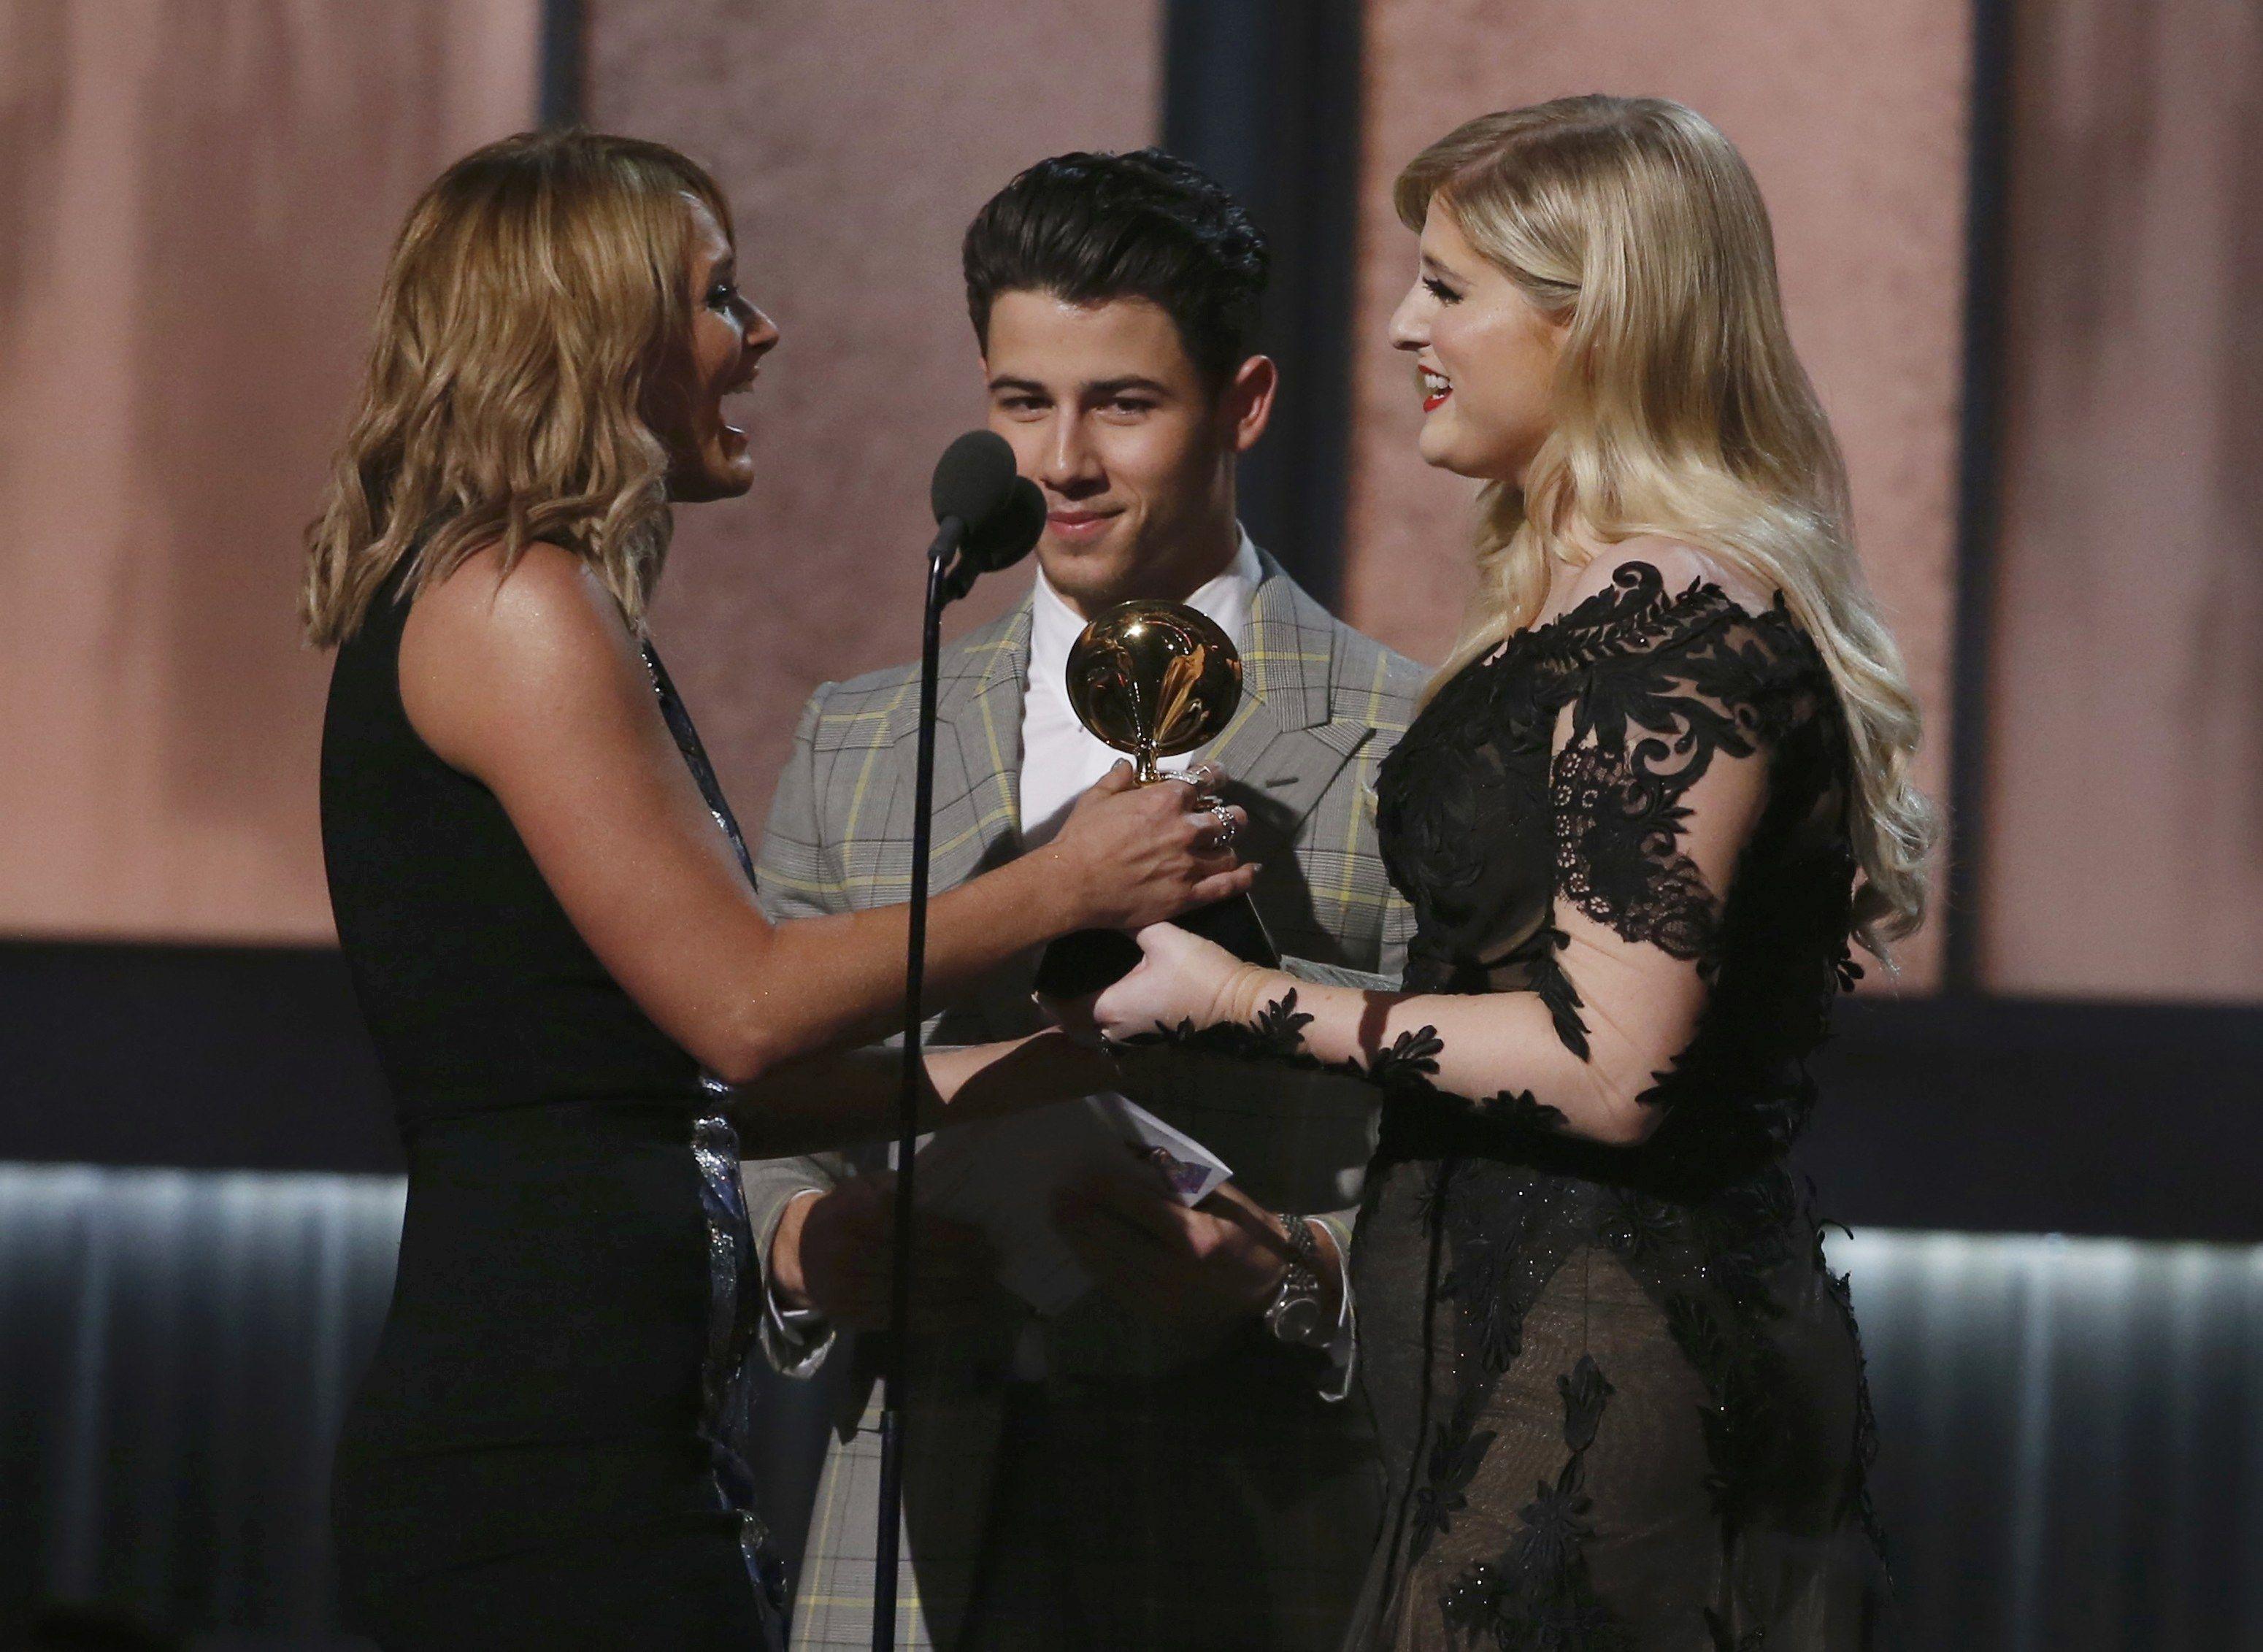 Рианна, Бейонсе и Фаррелл Уильямс получили награды Grammy-2015